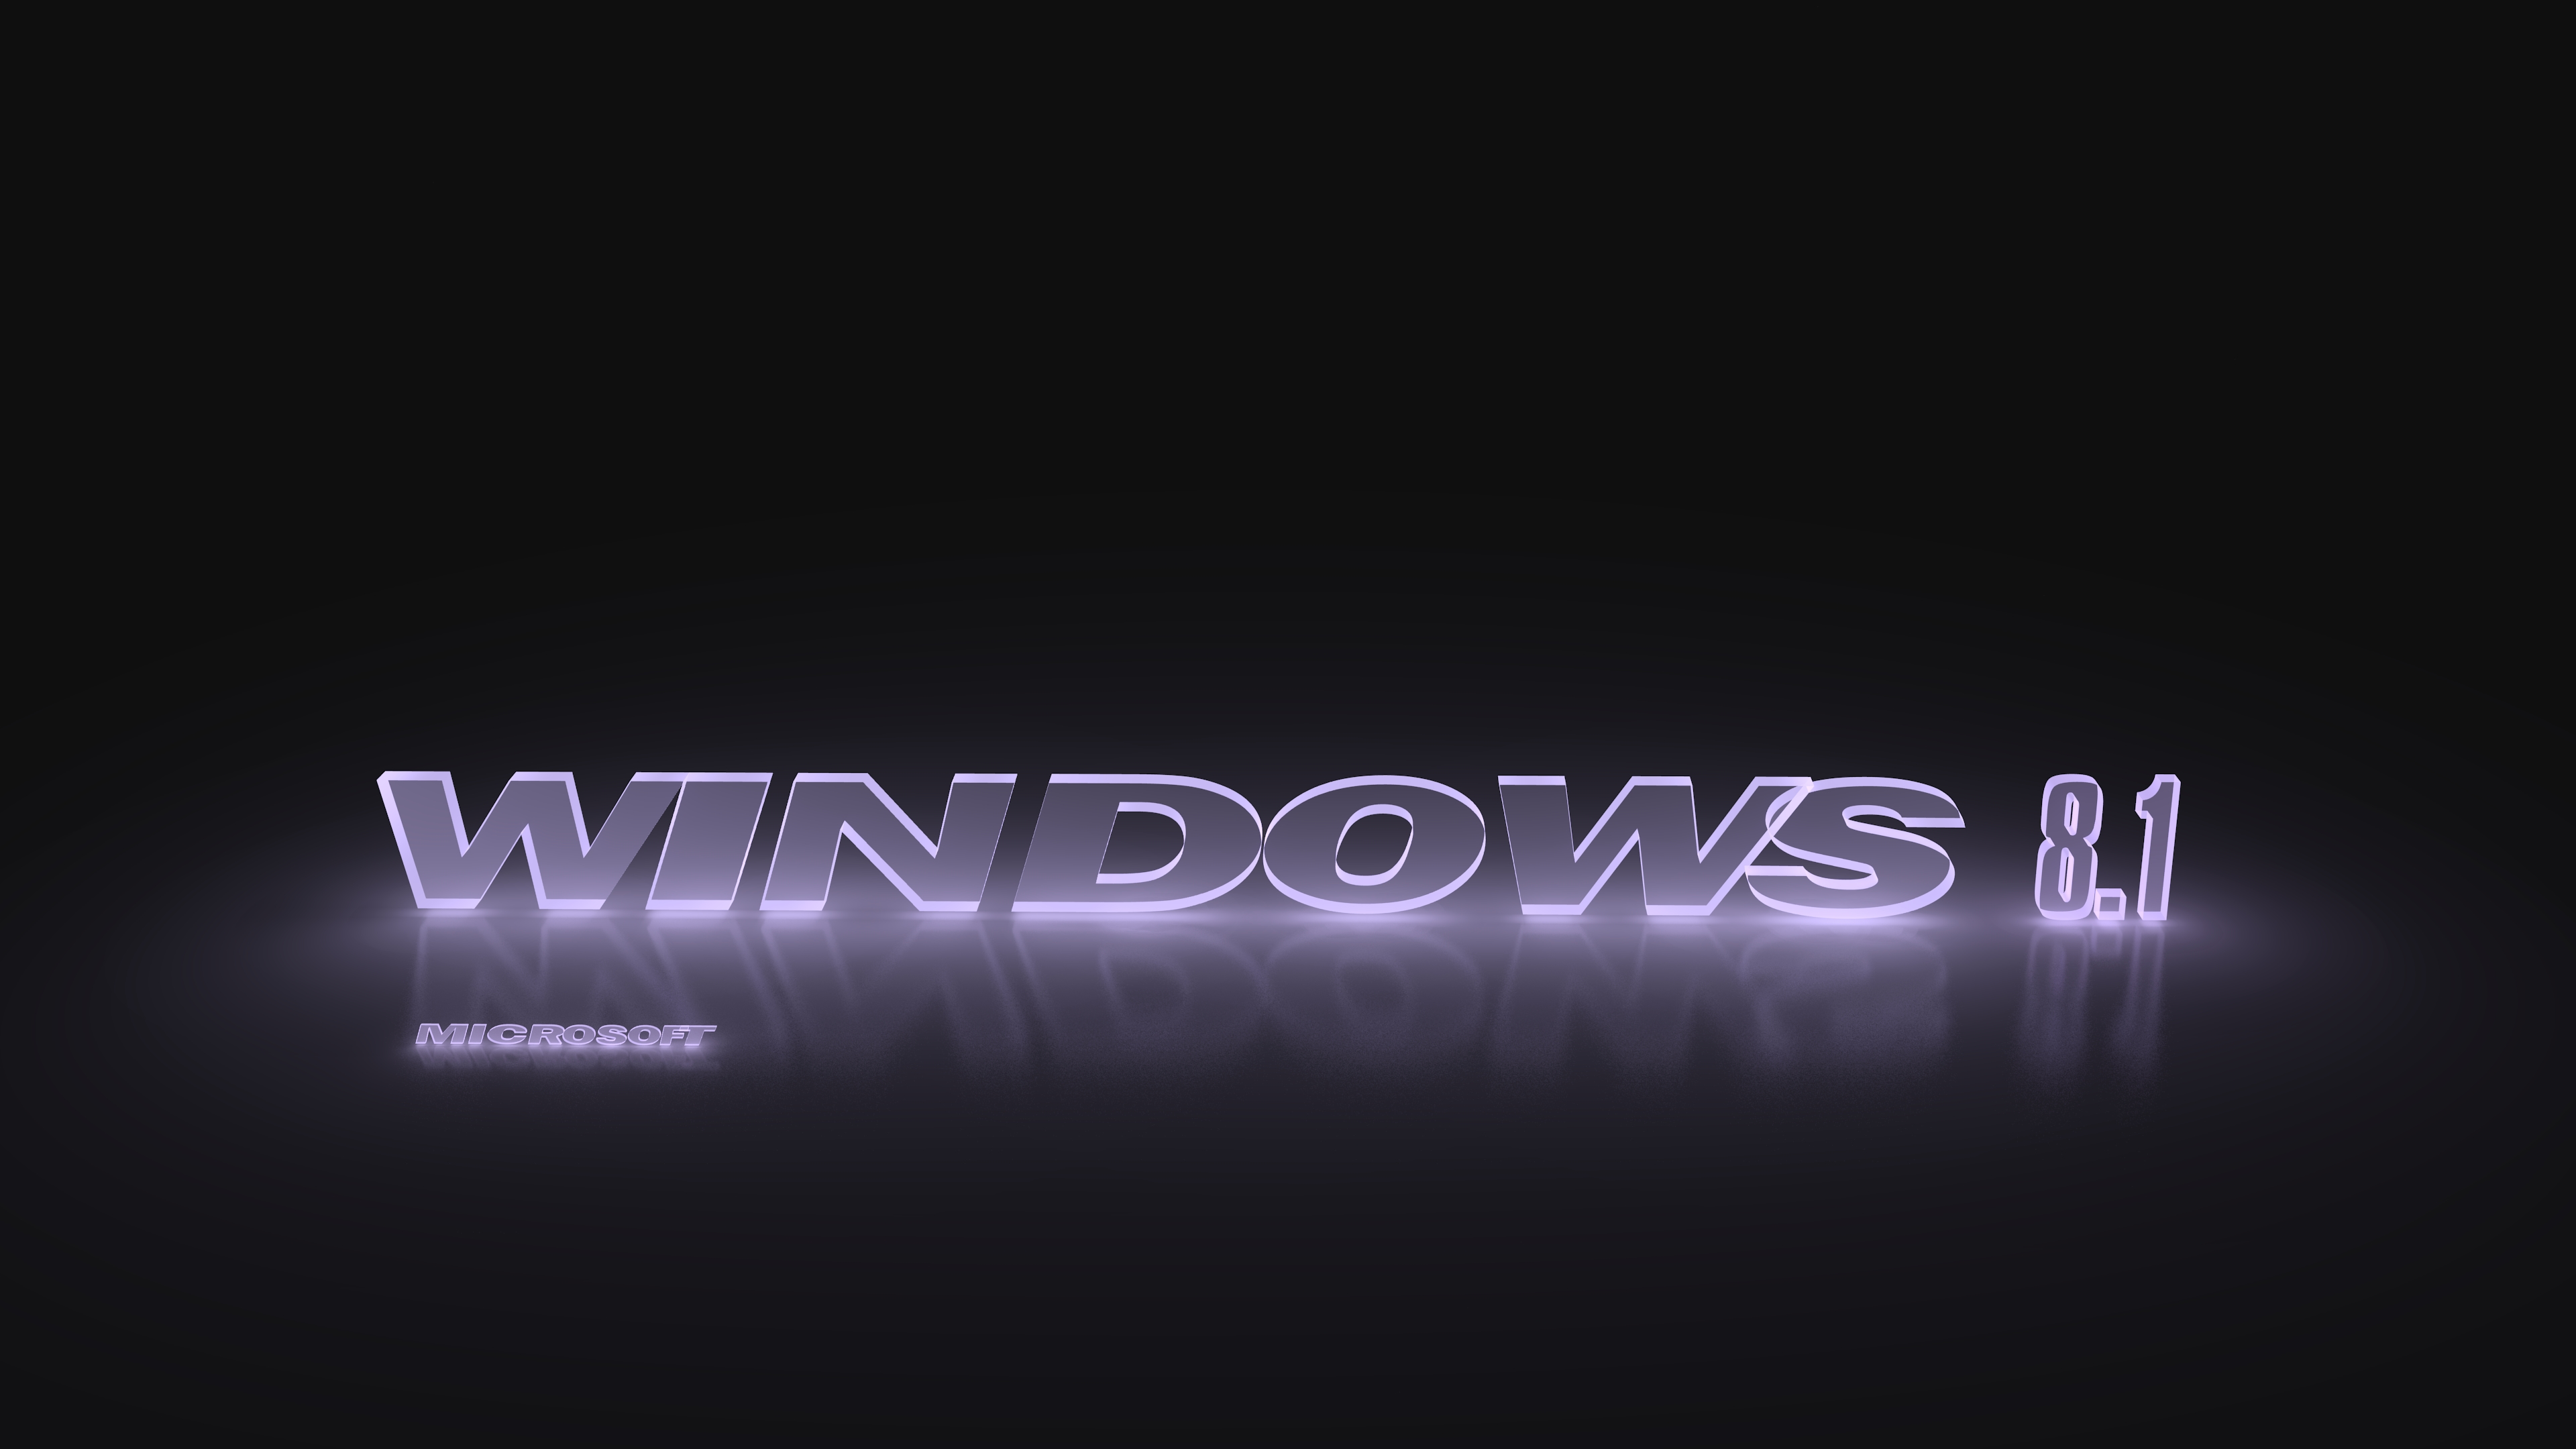 Win8 3d Wallpaper Windows 8 1 Glowing Light Violet Computer Wallpapers